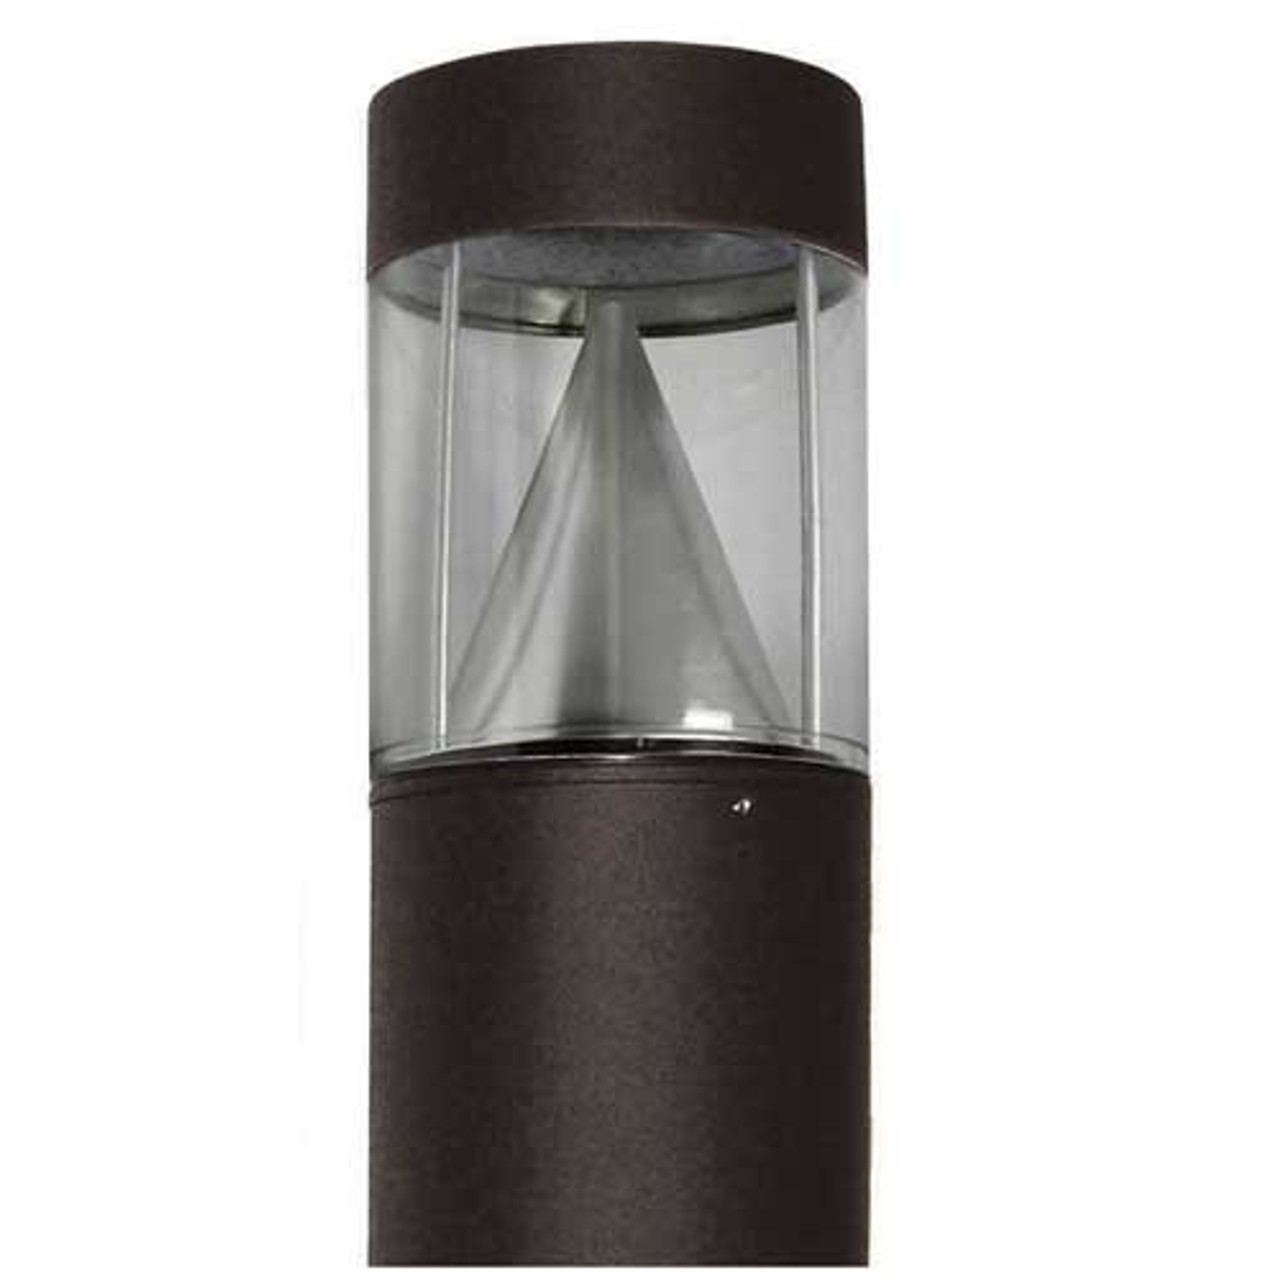 15 Watt Amber LED Lighting Bollard Flat Top Cone Reflector